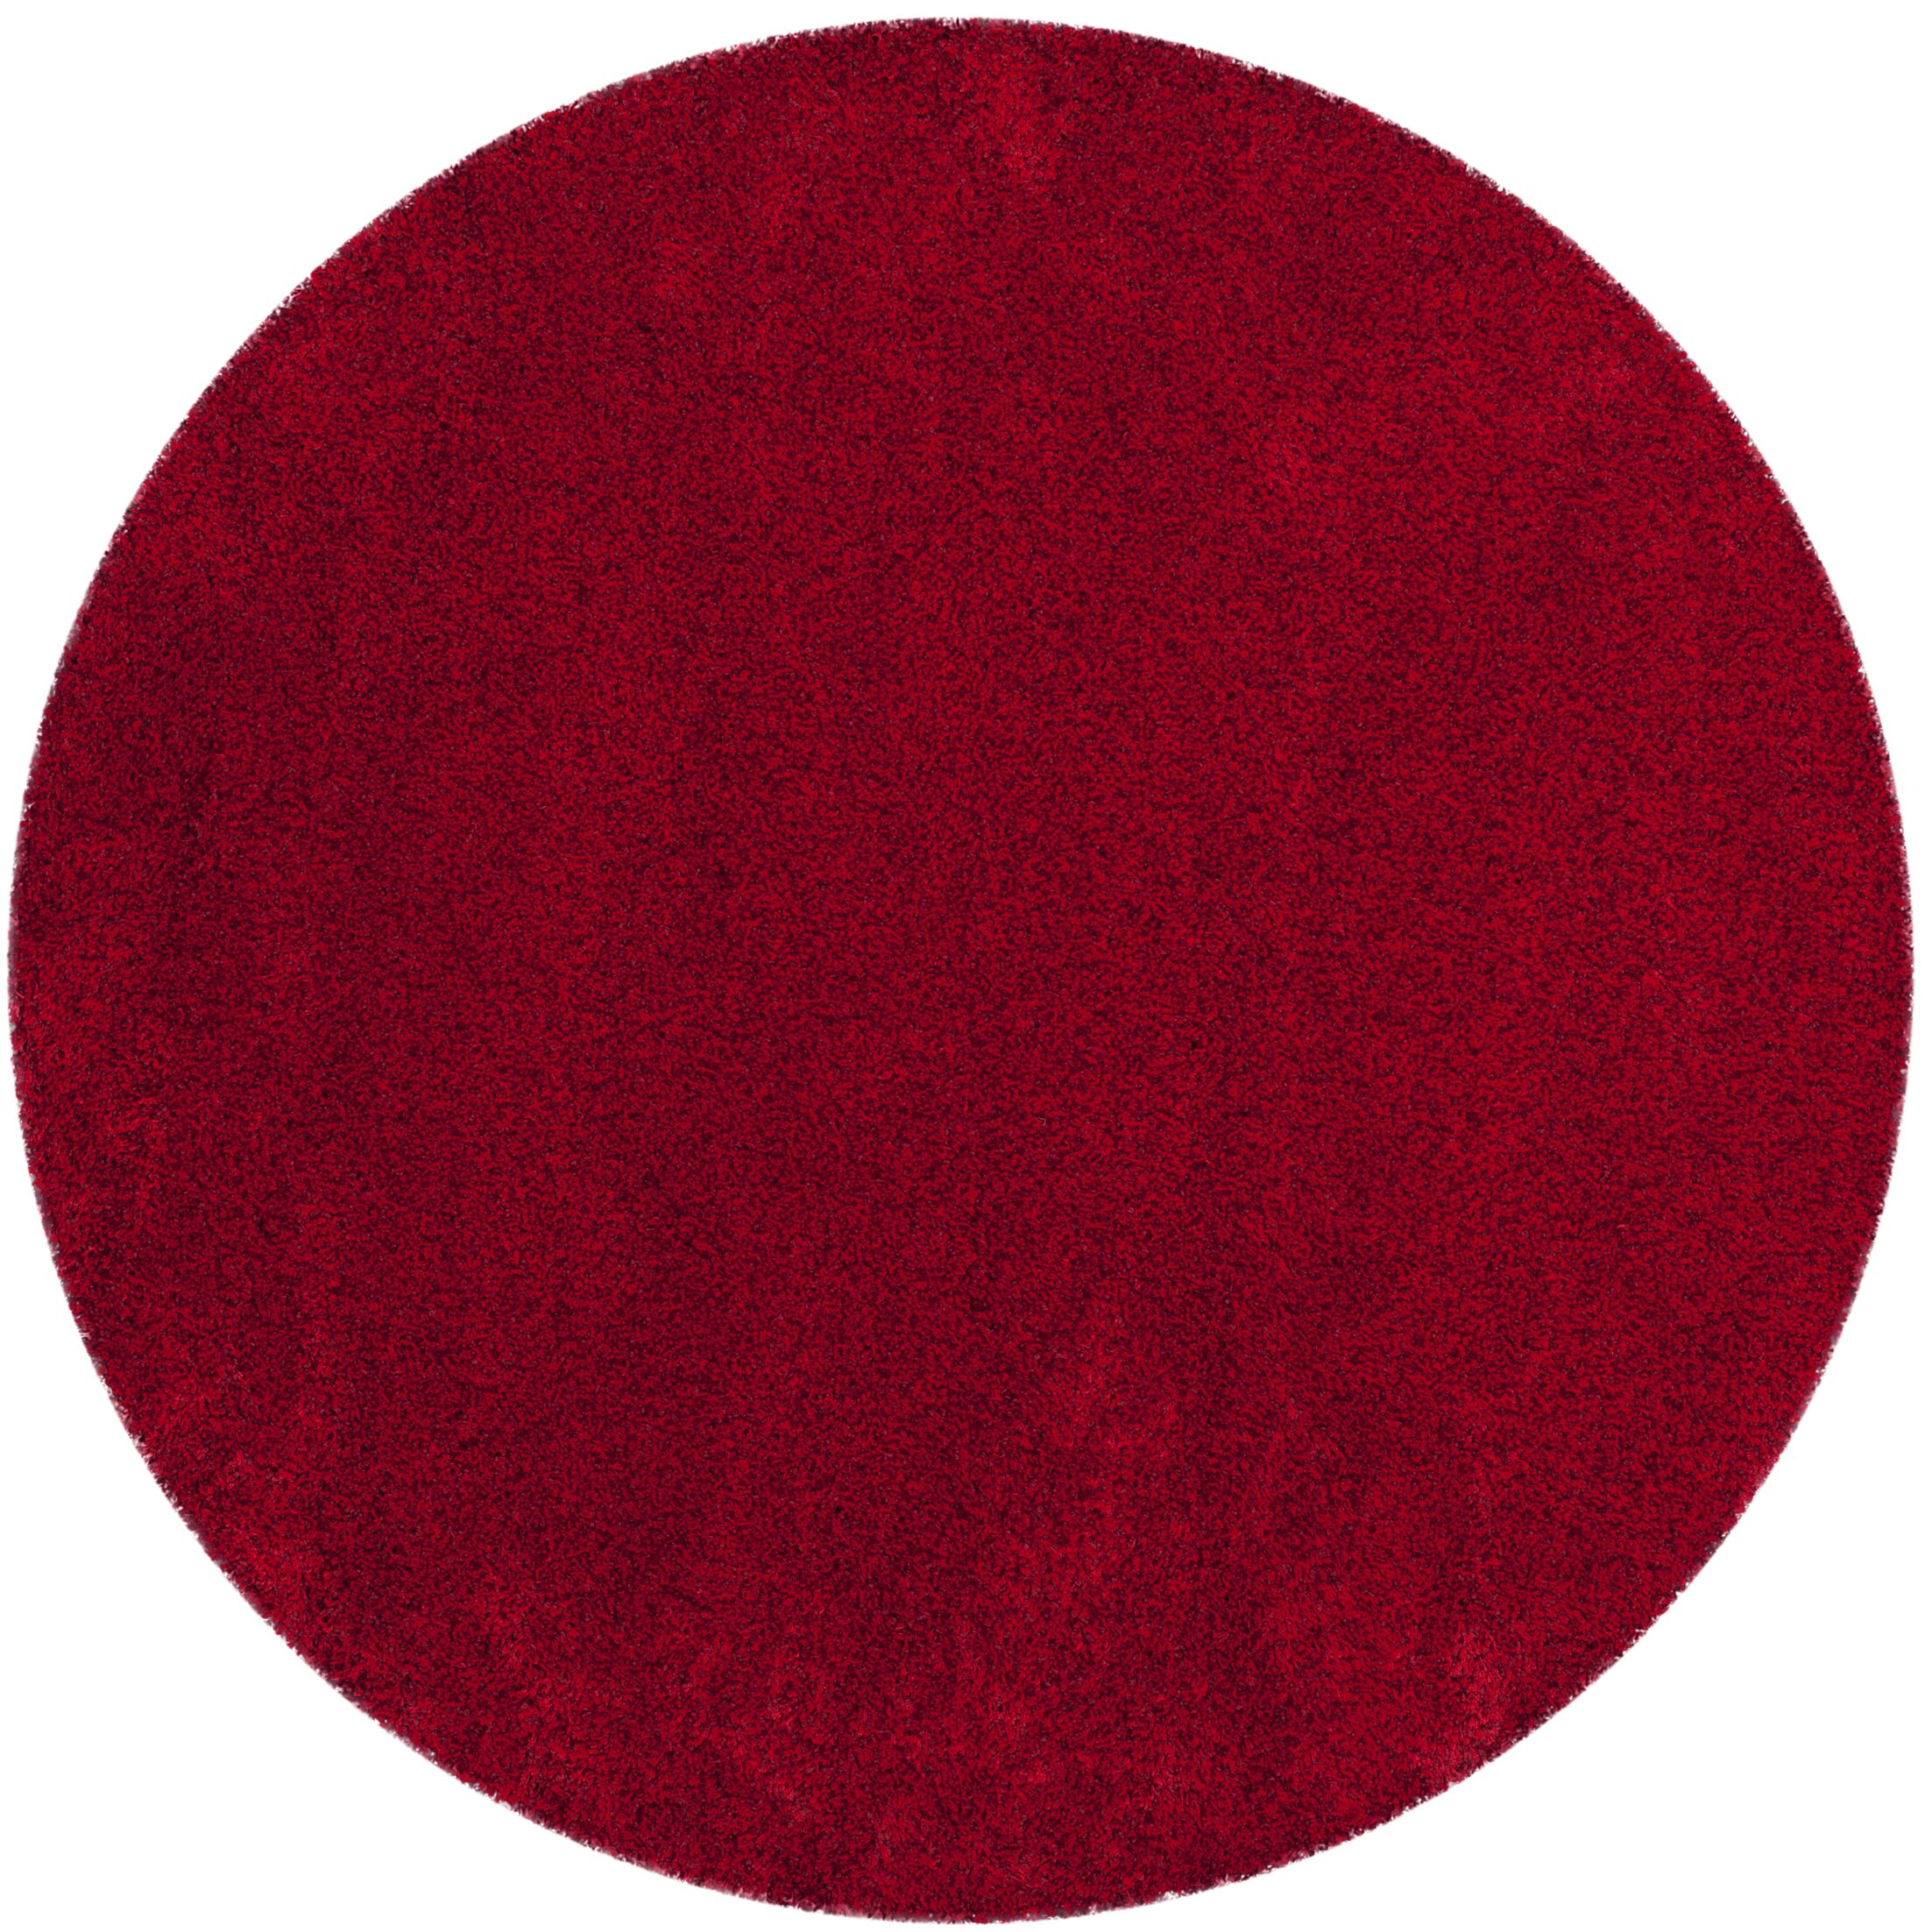 Brickner Red Area Rug Rug Size: Round 6'7